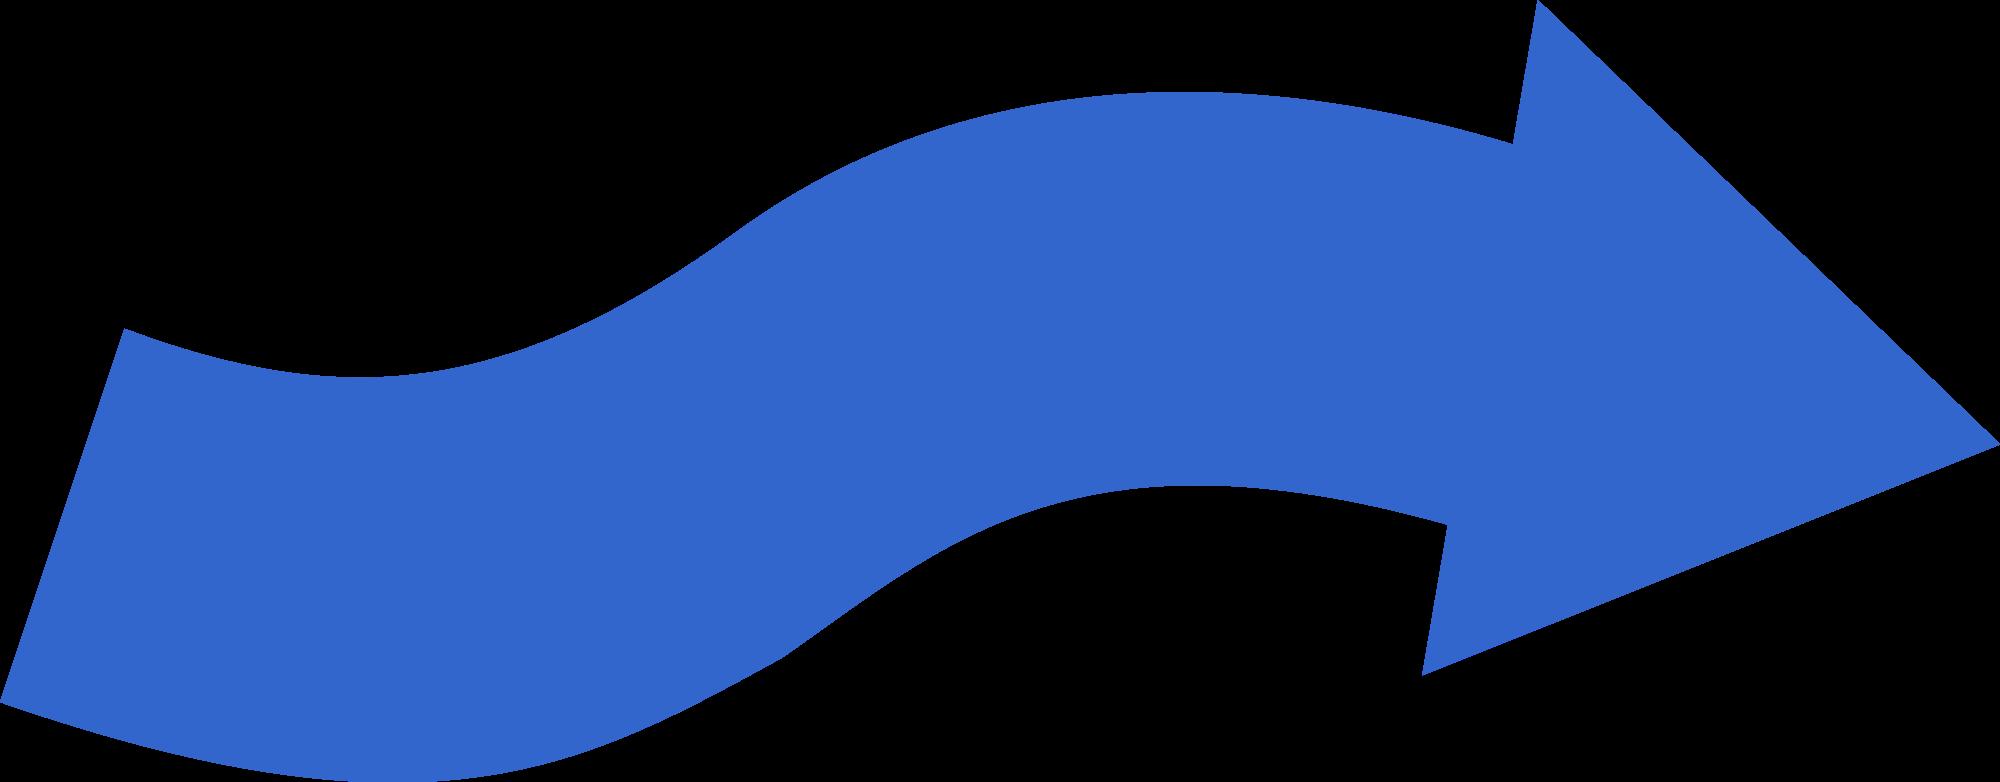 png transparent library Wavy arrow clipart. File arrows move svg